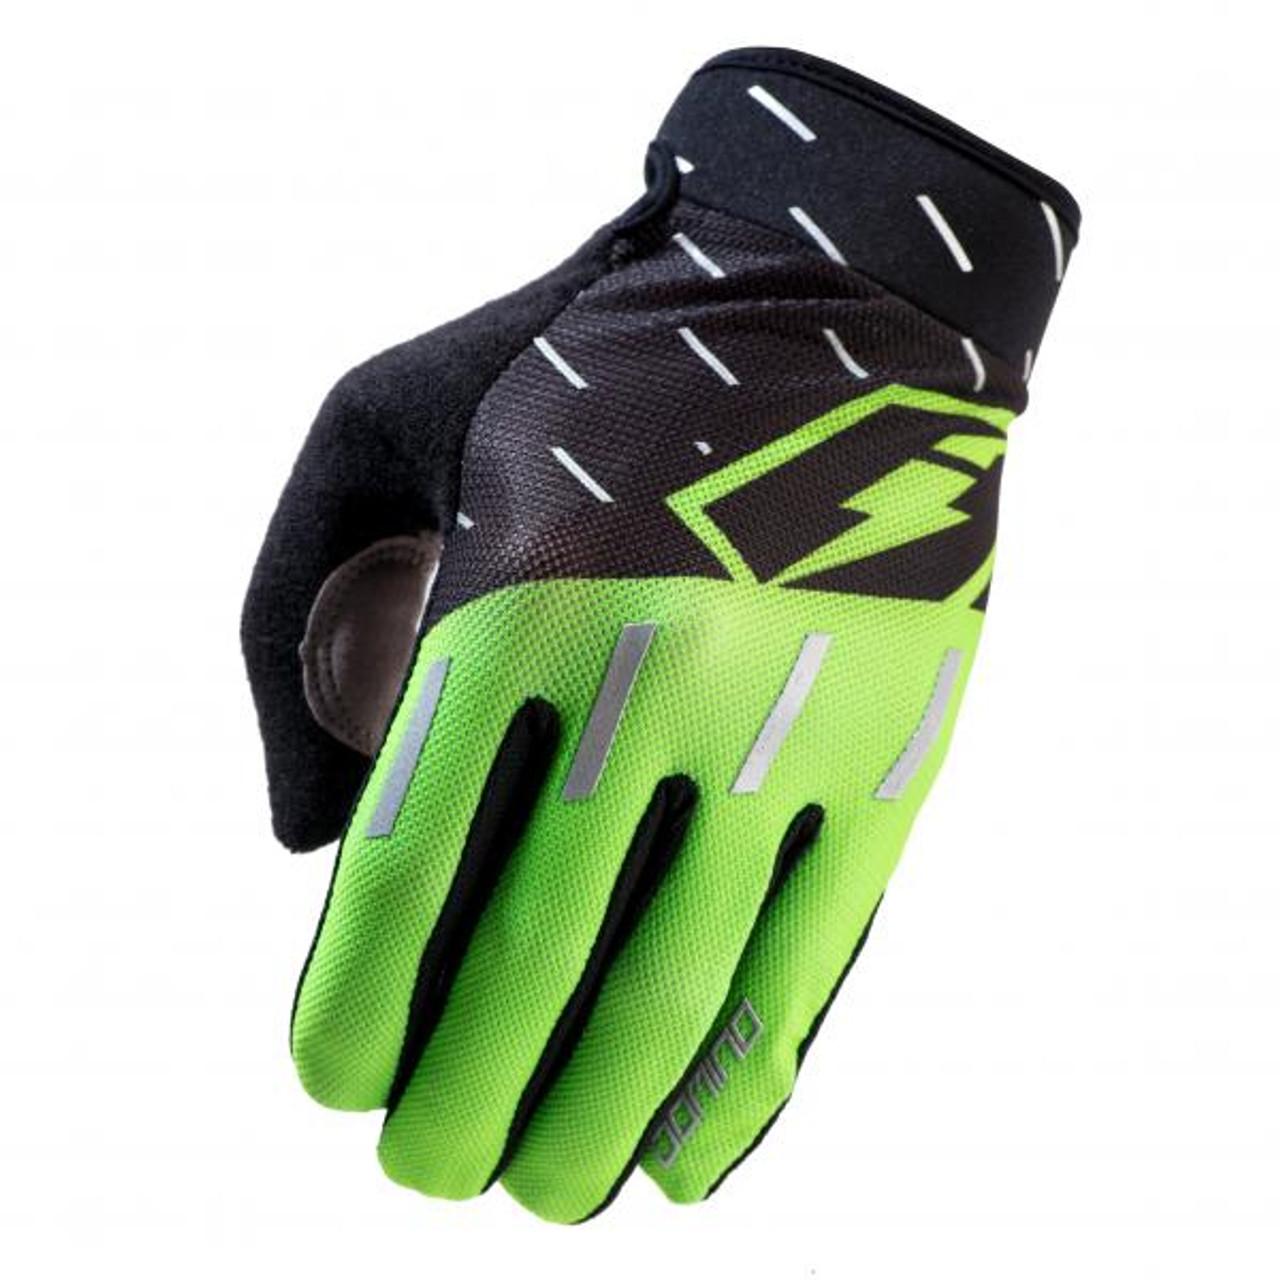 Gloves Domino, black/ fluo green/ silver